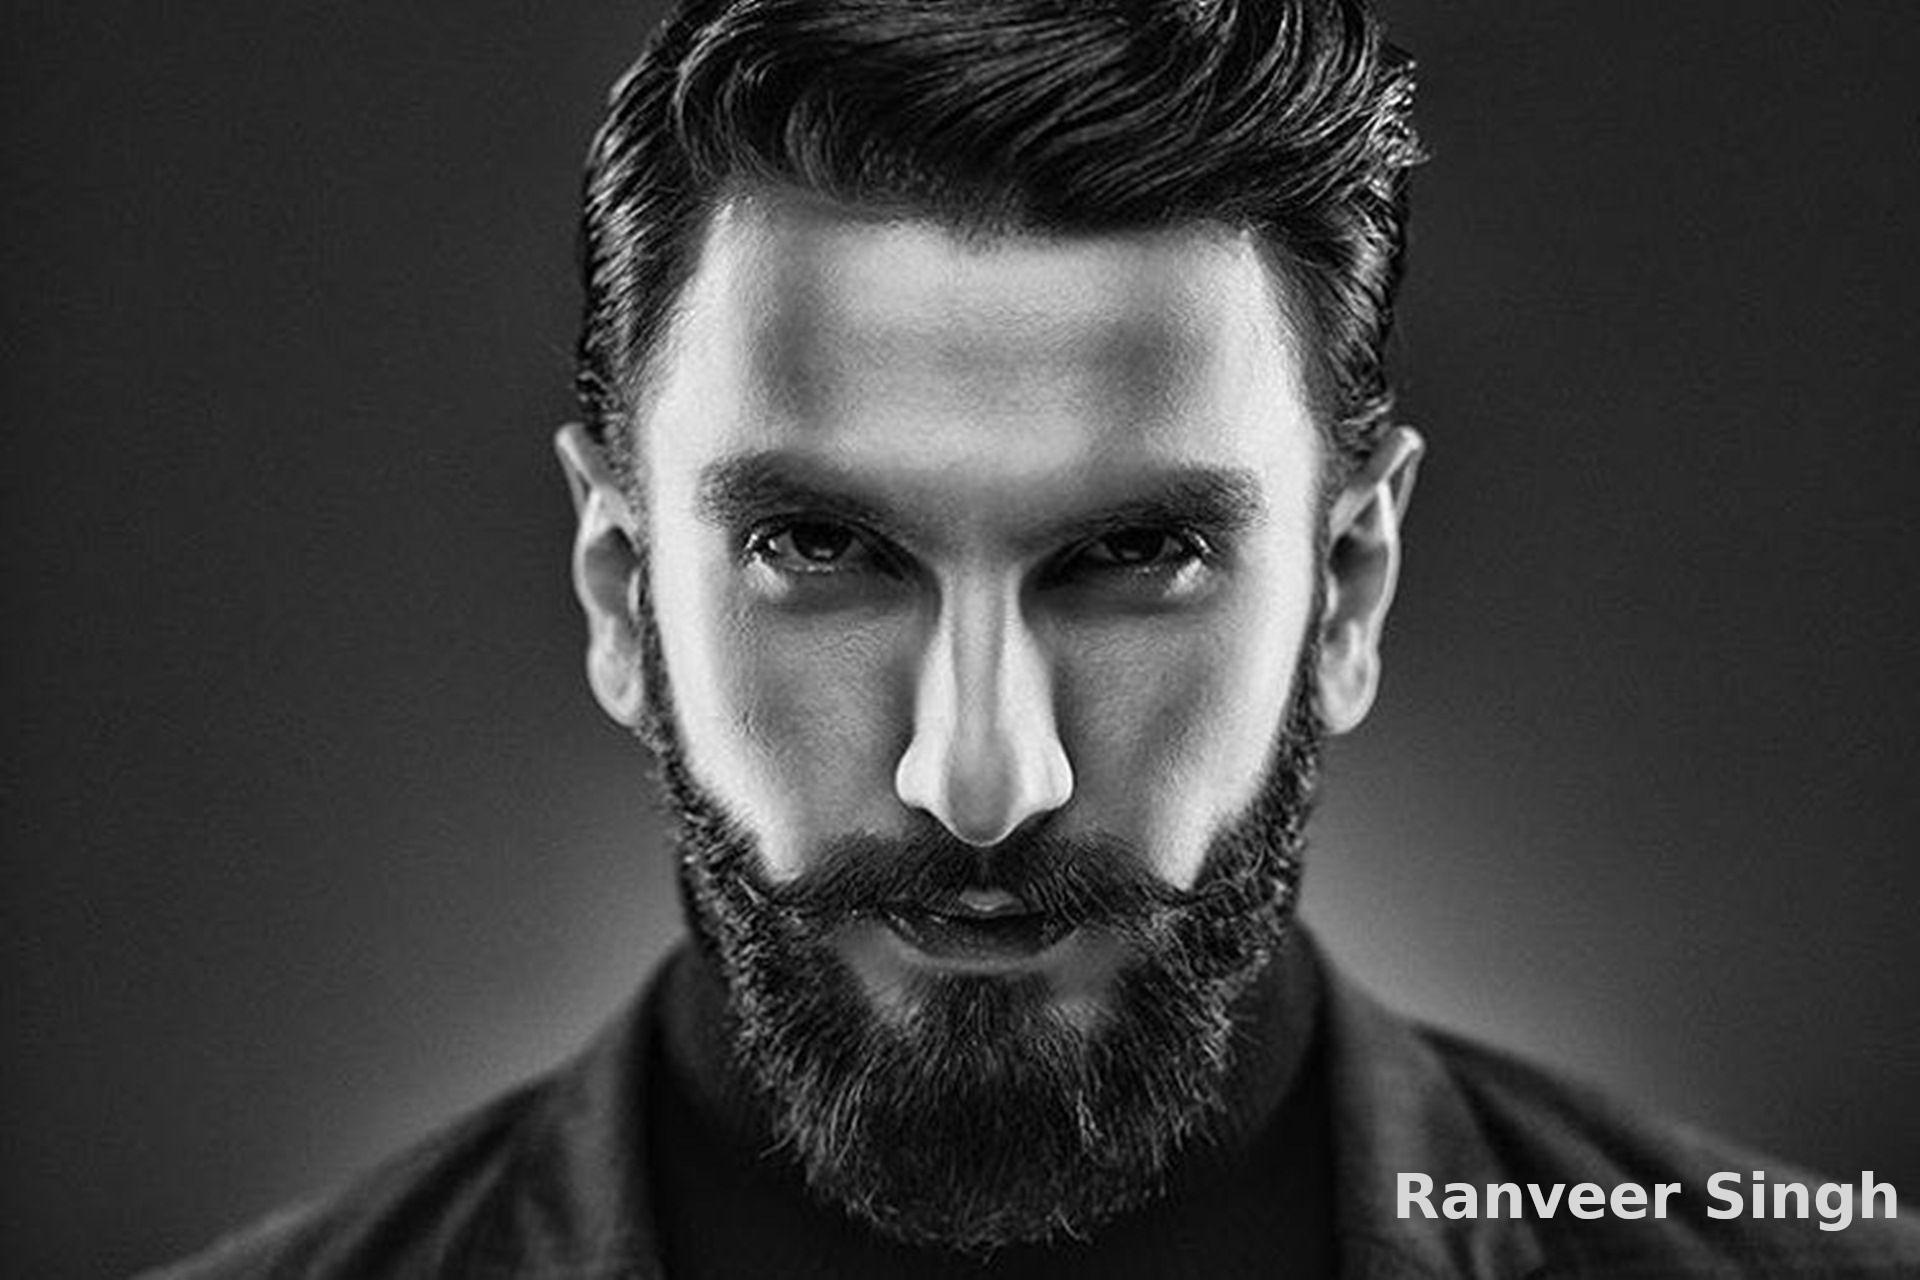 Ranveer singh latest photo for wallpaper hd wallpapers - Ranveer singh hd wallpaper padmavati ...